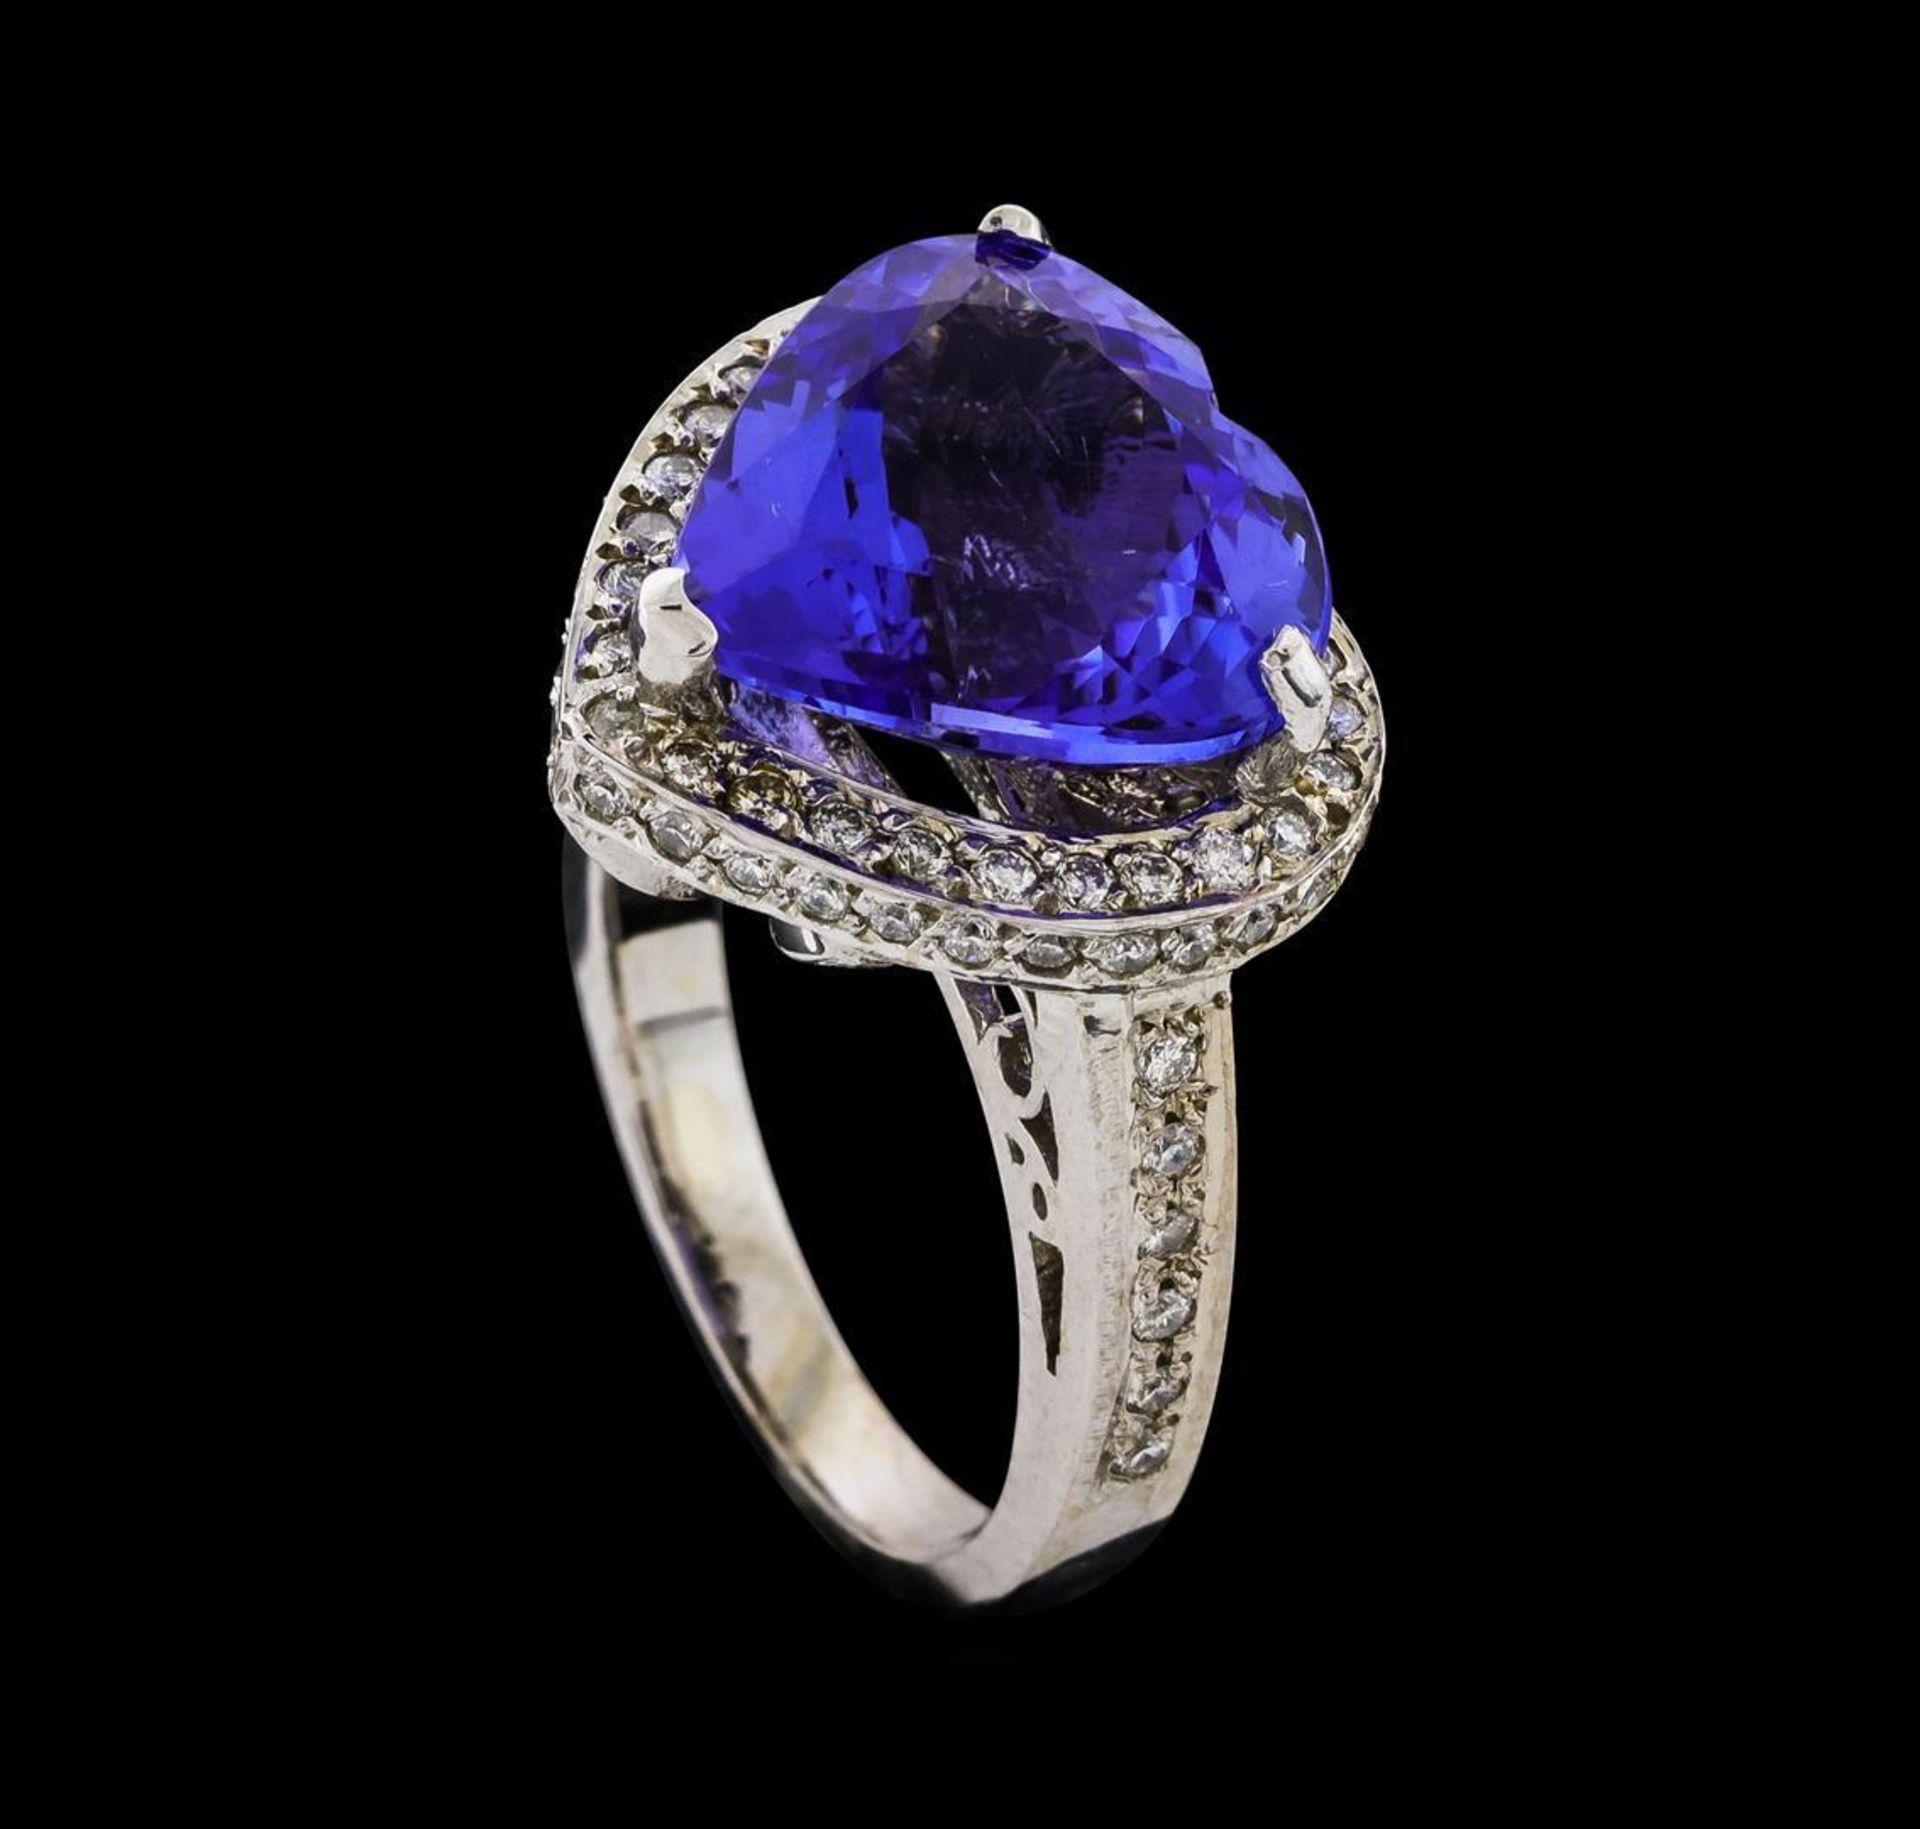 GIA Cert 7.72 ctw Tanzanite and Diamond Ring - 14KT White Gold - Image 4 of 6